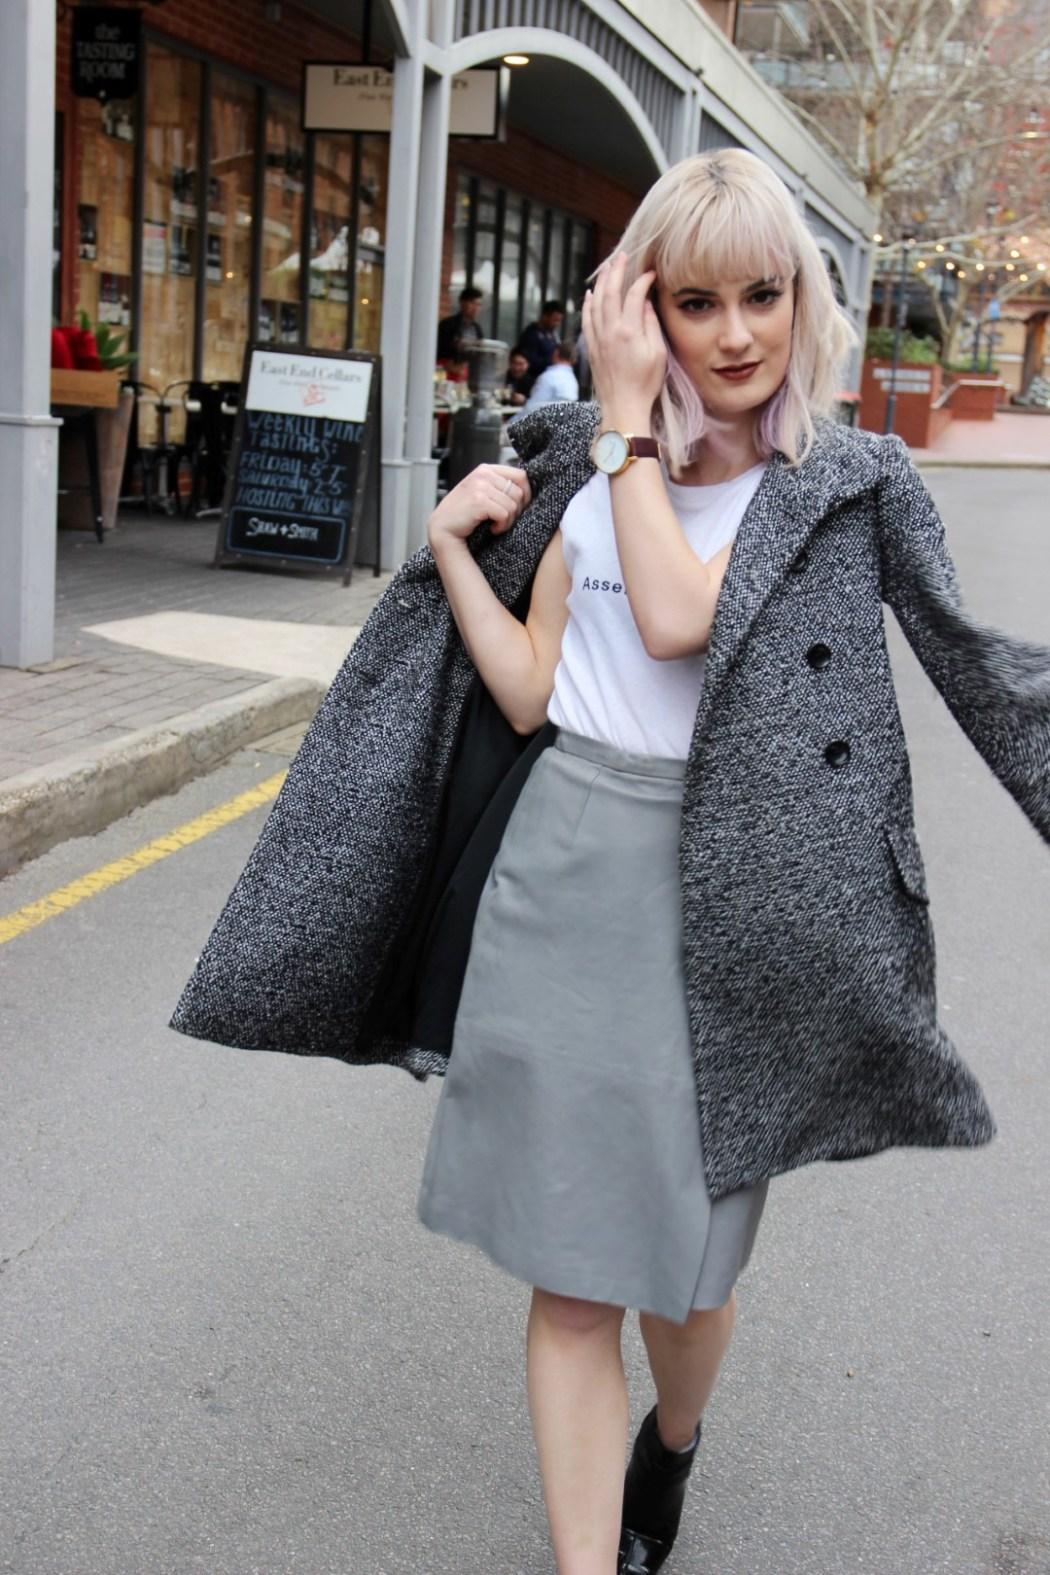 Kristen byass free at heart fashion